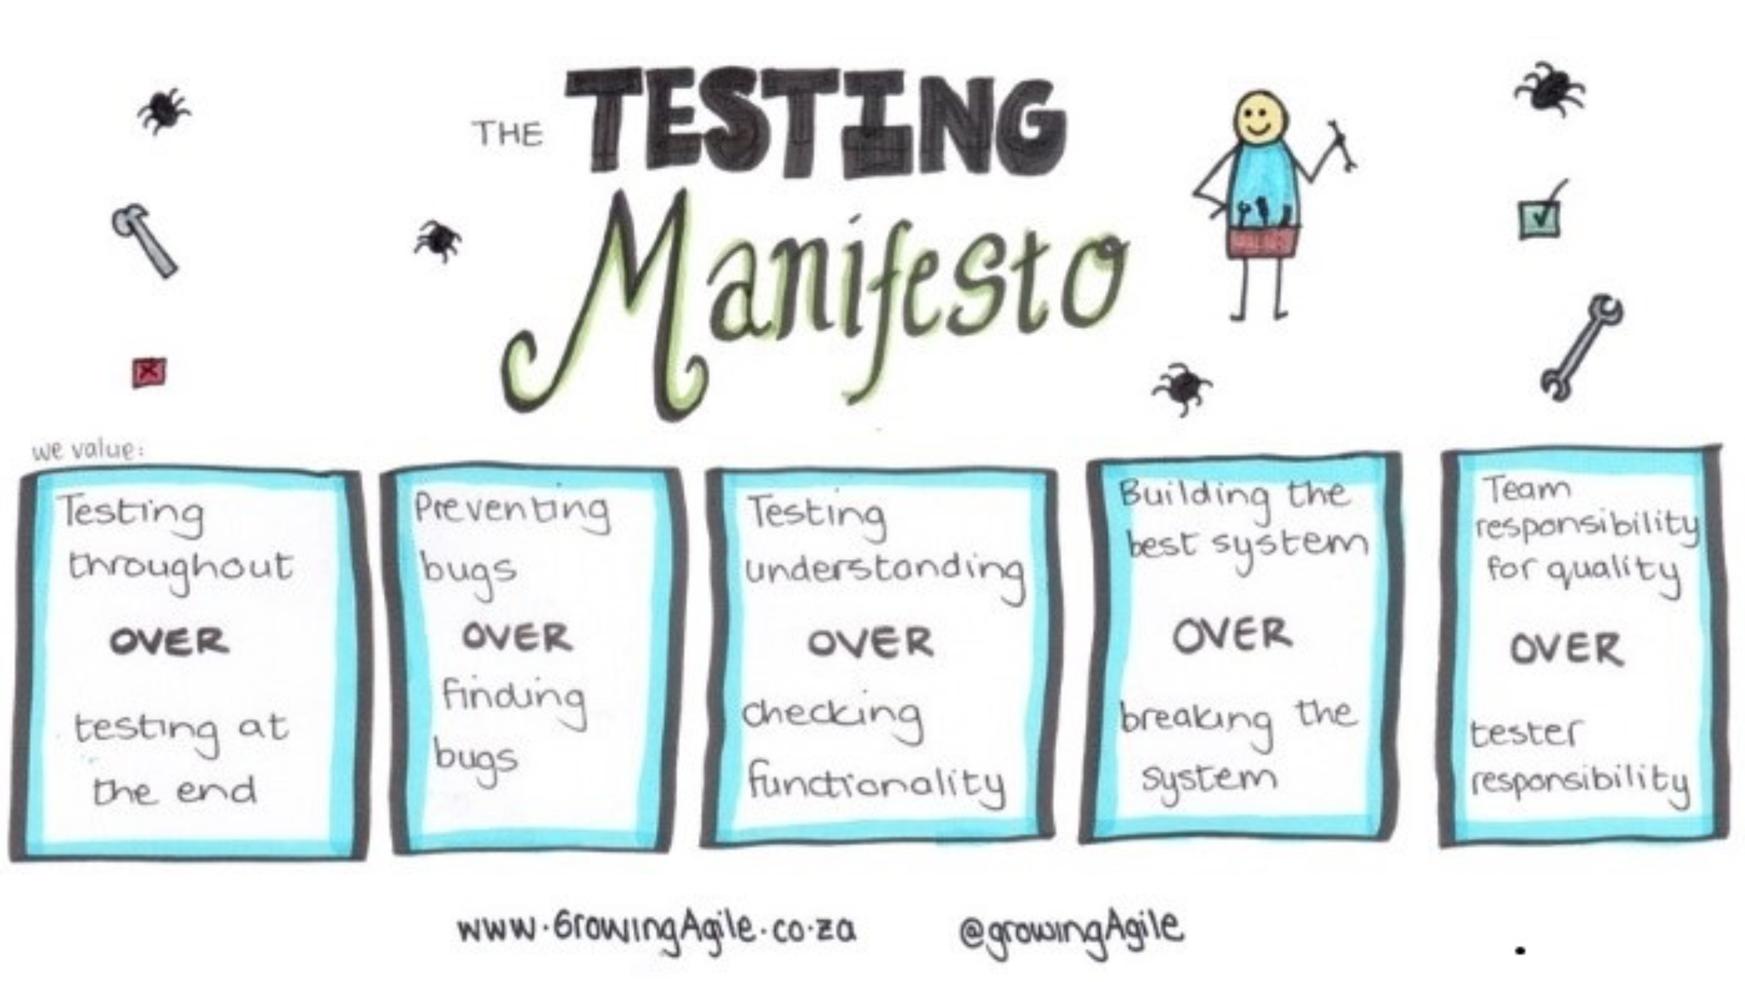 The Testing Manifesto